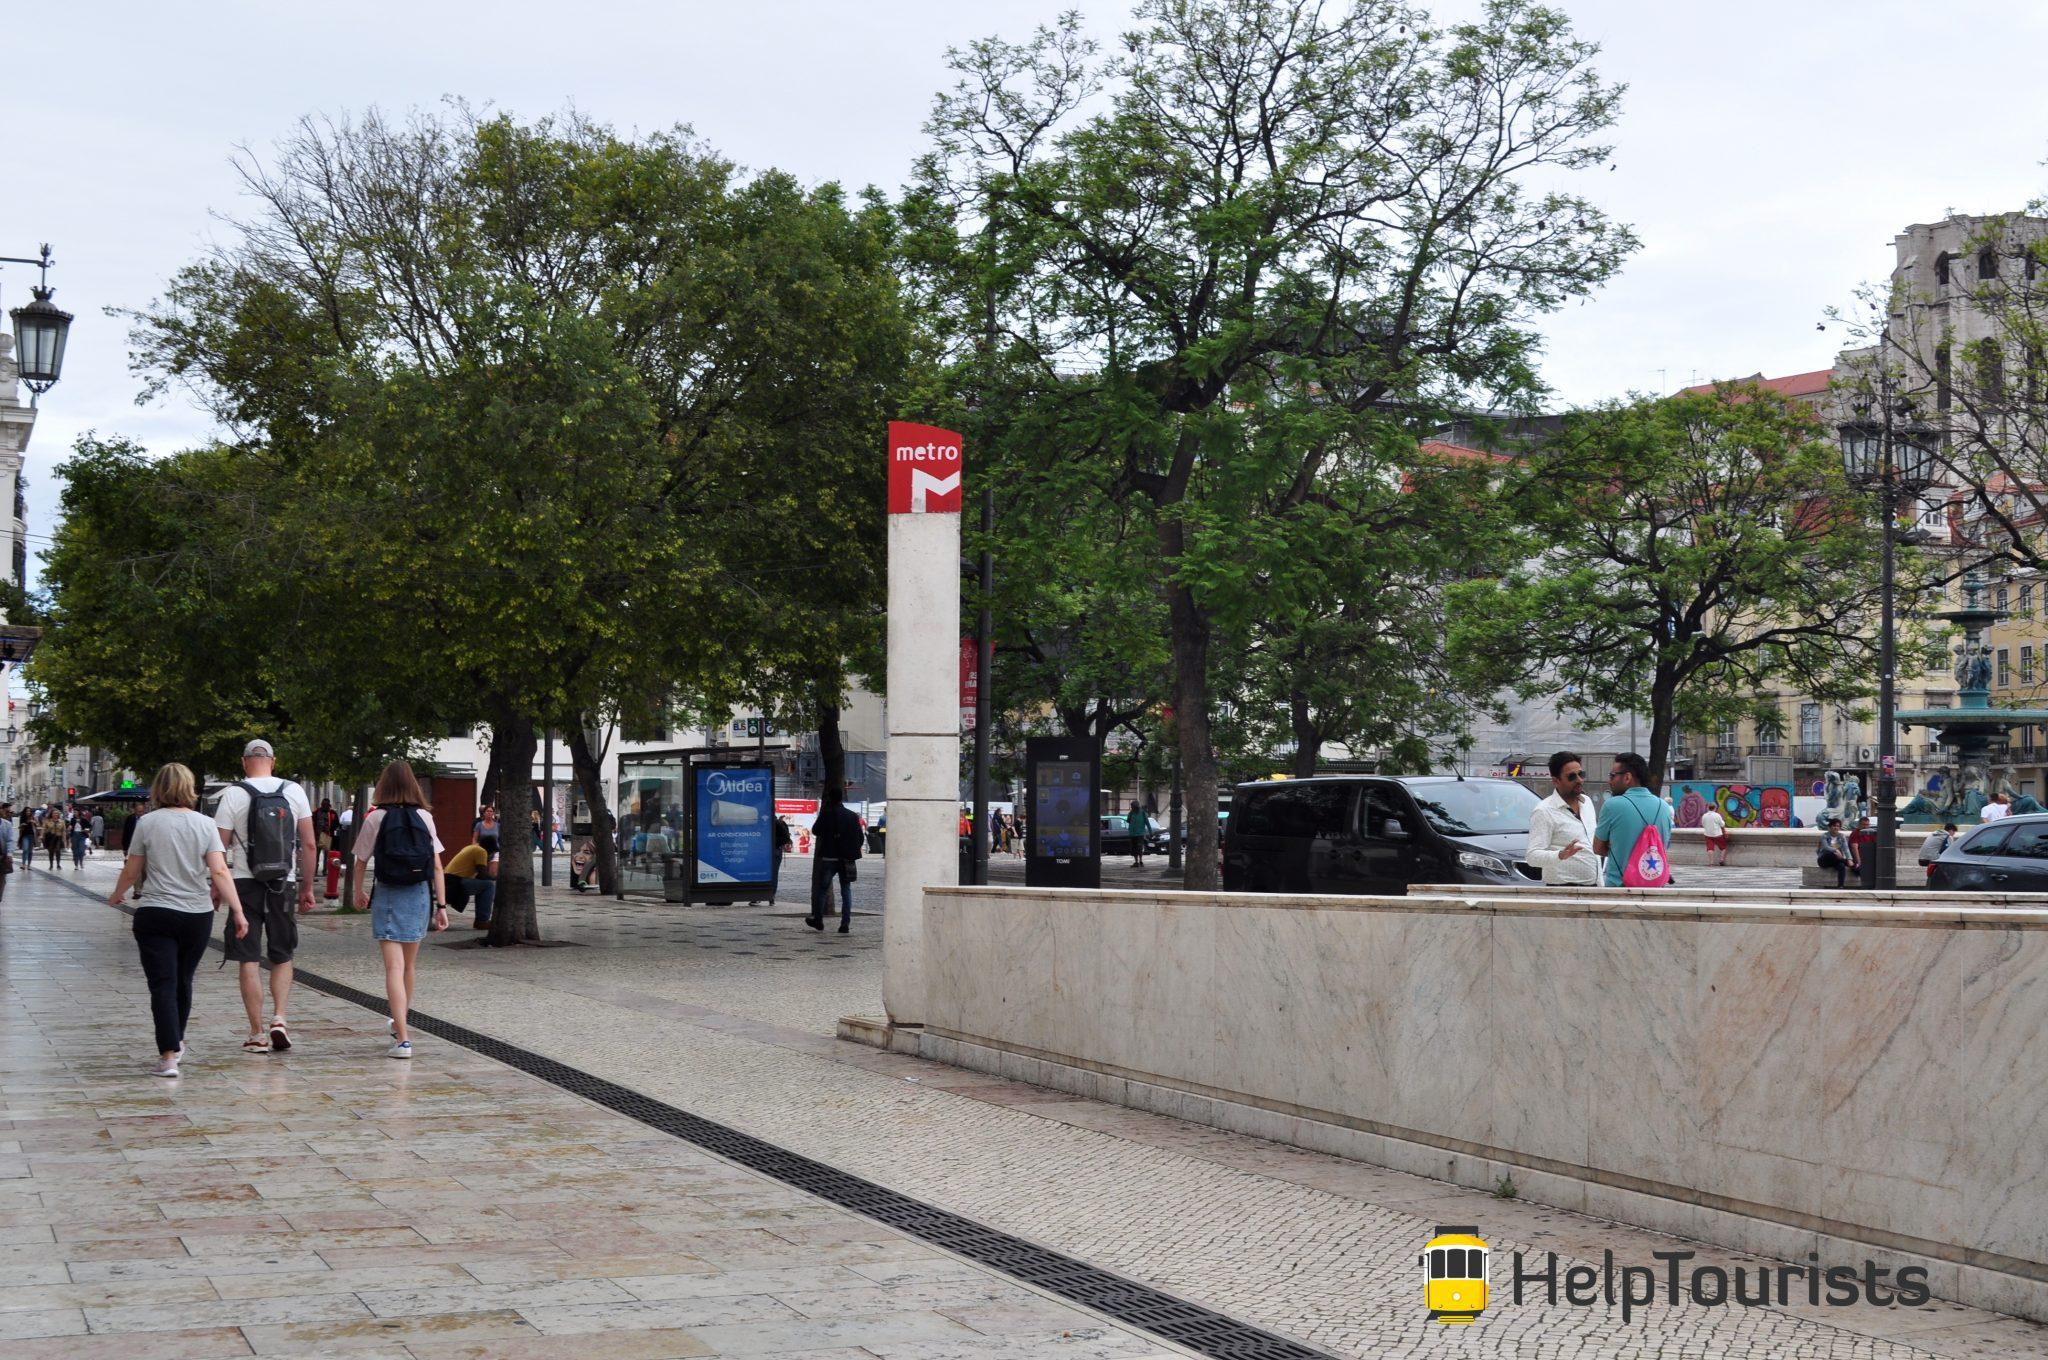 Lissabon U-Bahn Station Ausgang